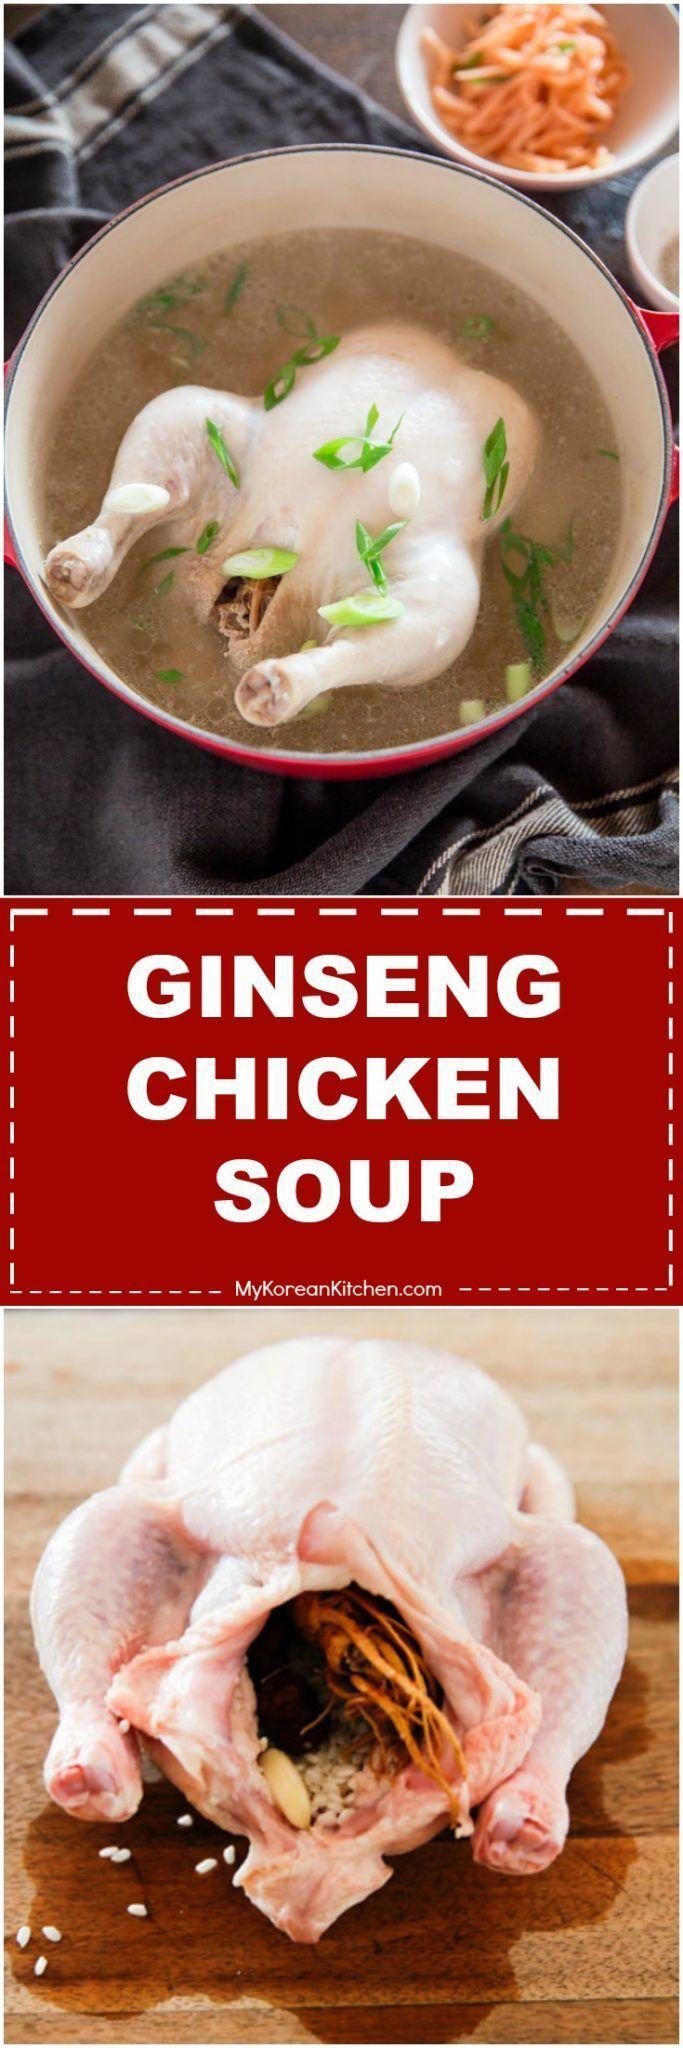 Samgyetang Korean Ginseng Chicken Soup Recipe Ginseng Chicken Soup Recipes Asian Recipes